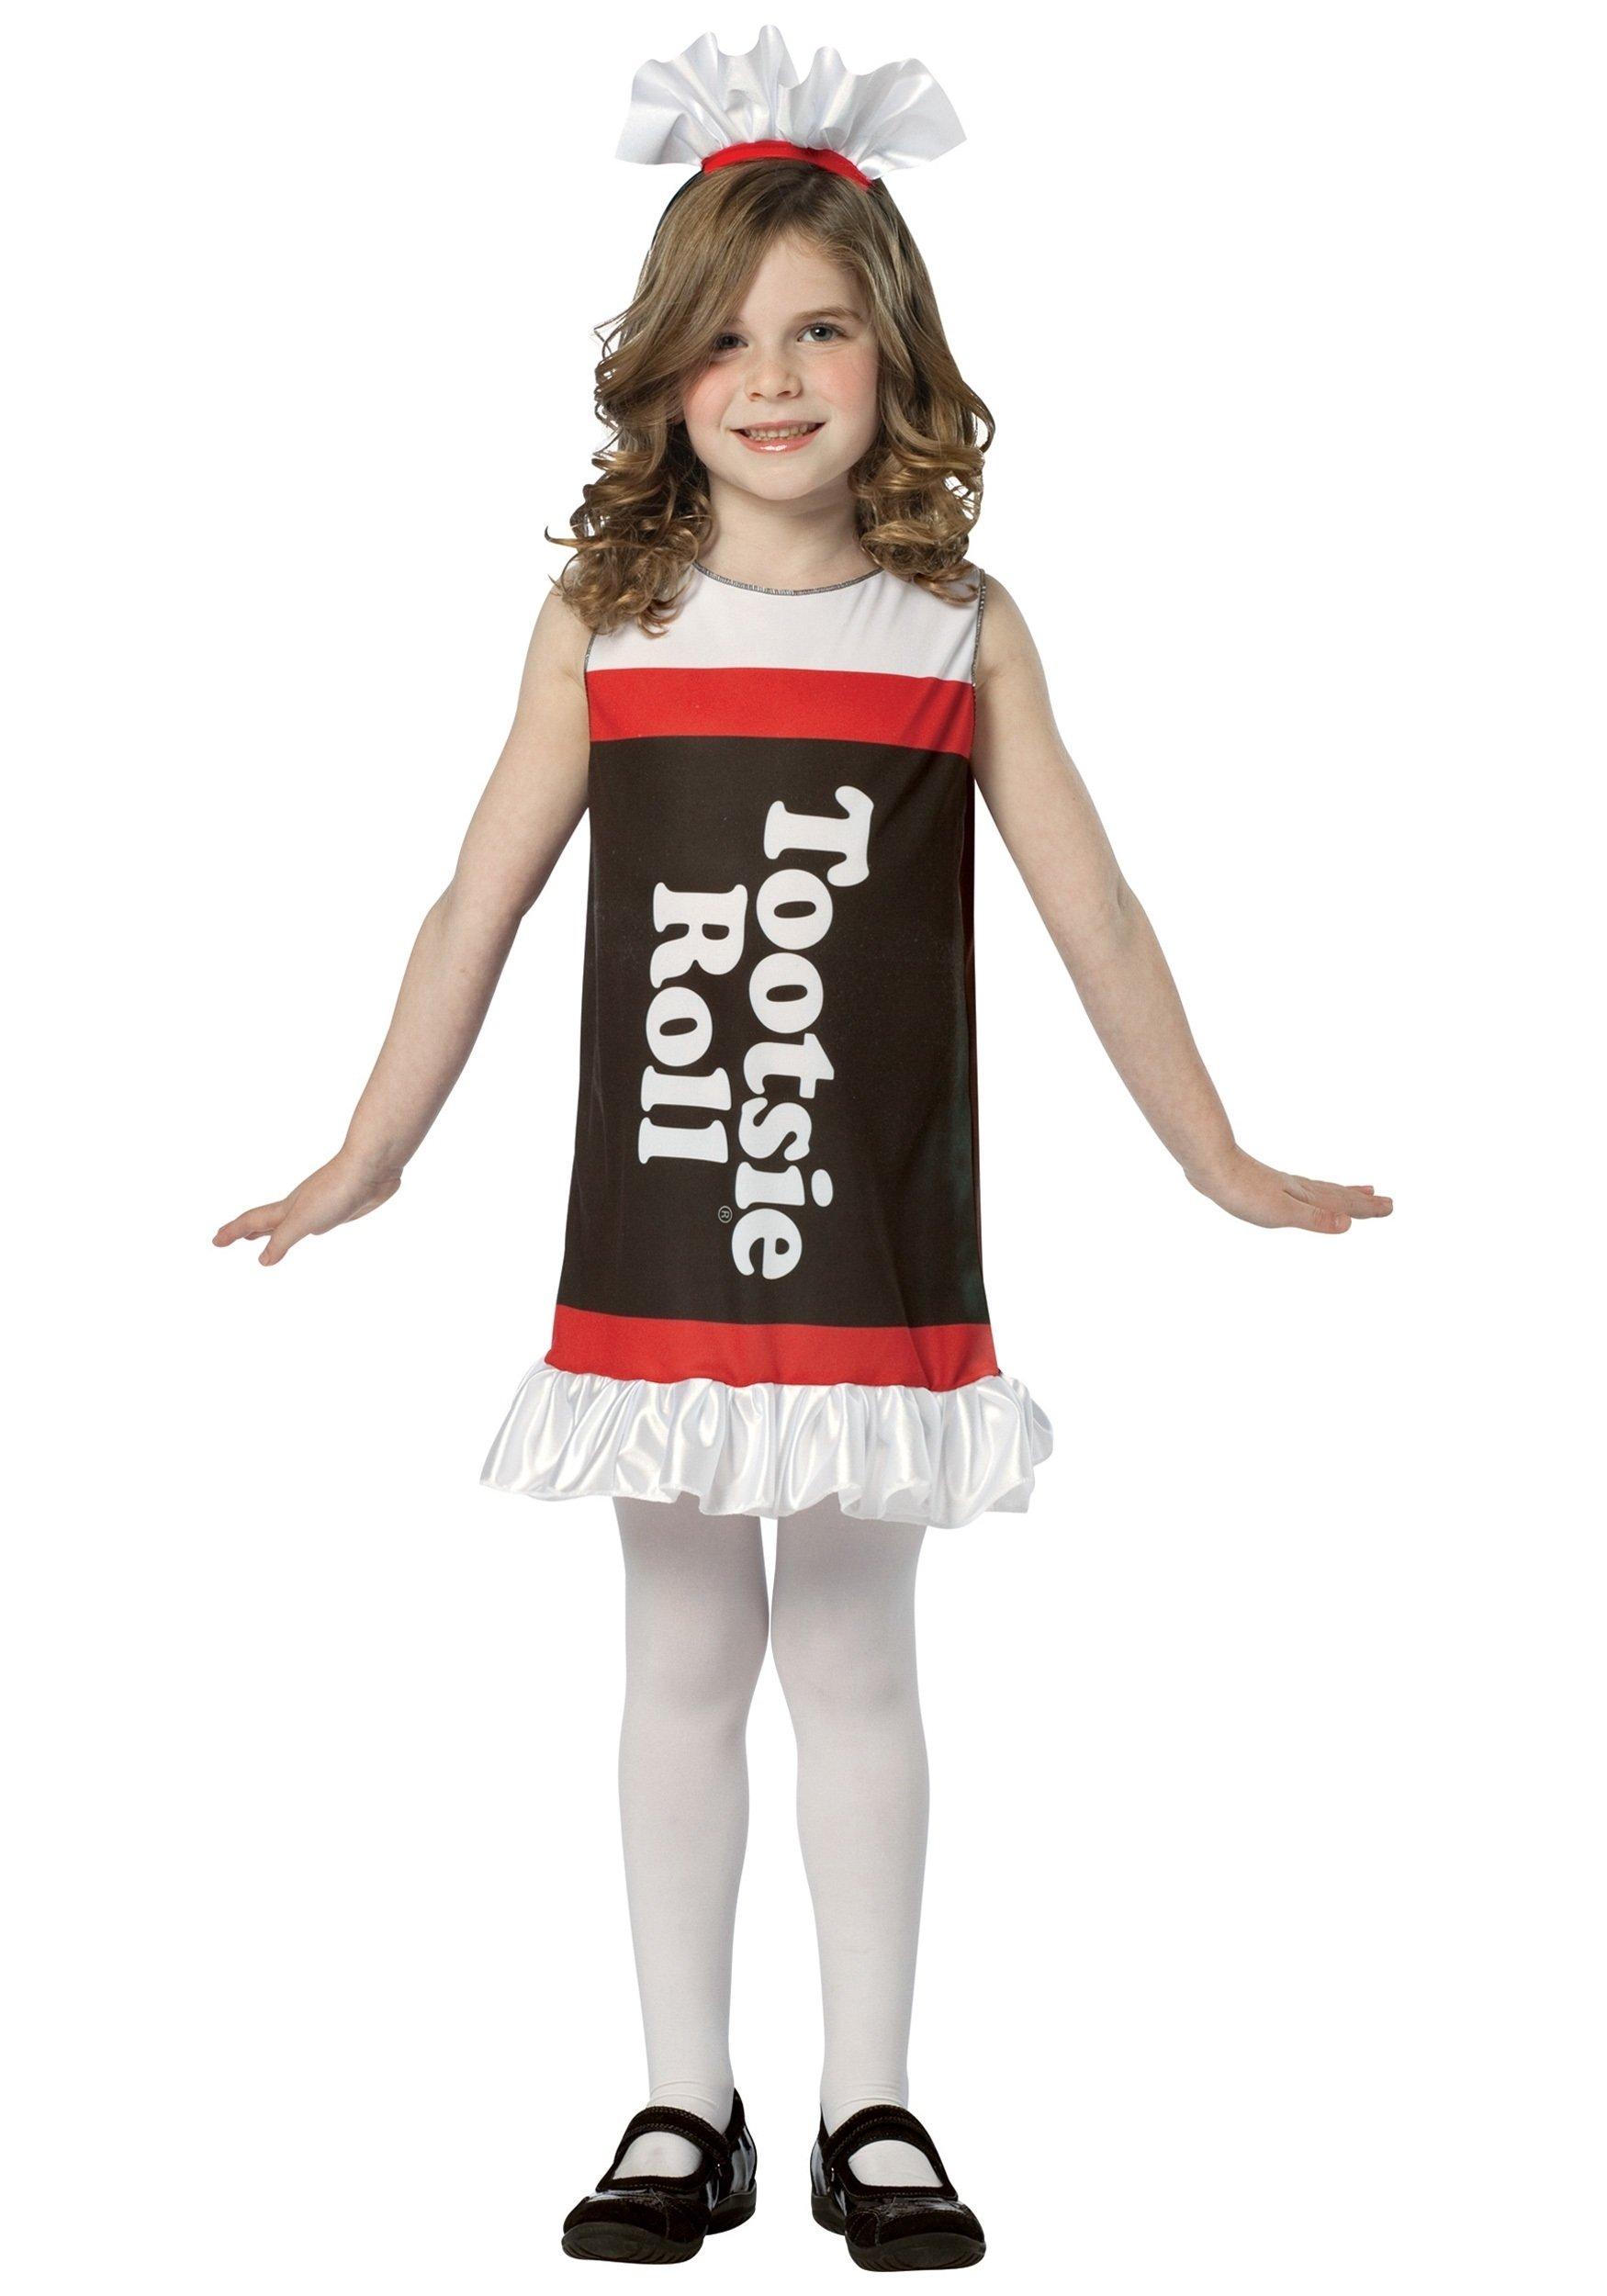 10 fashionable halloween costume ideas for girls girls tootsie roll dress 9